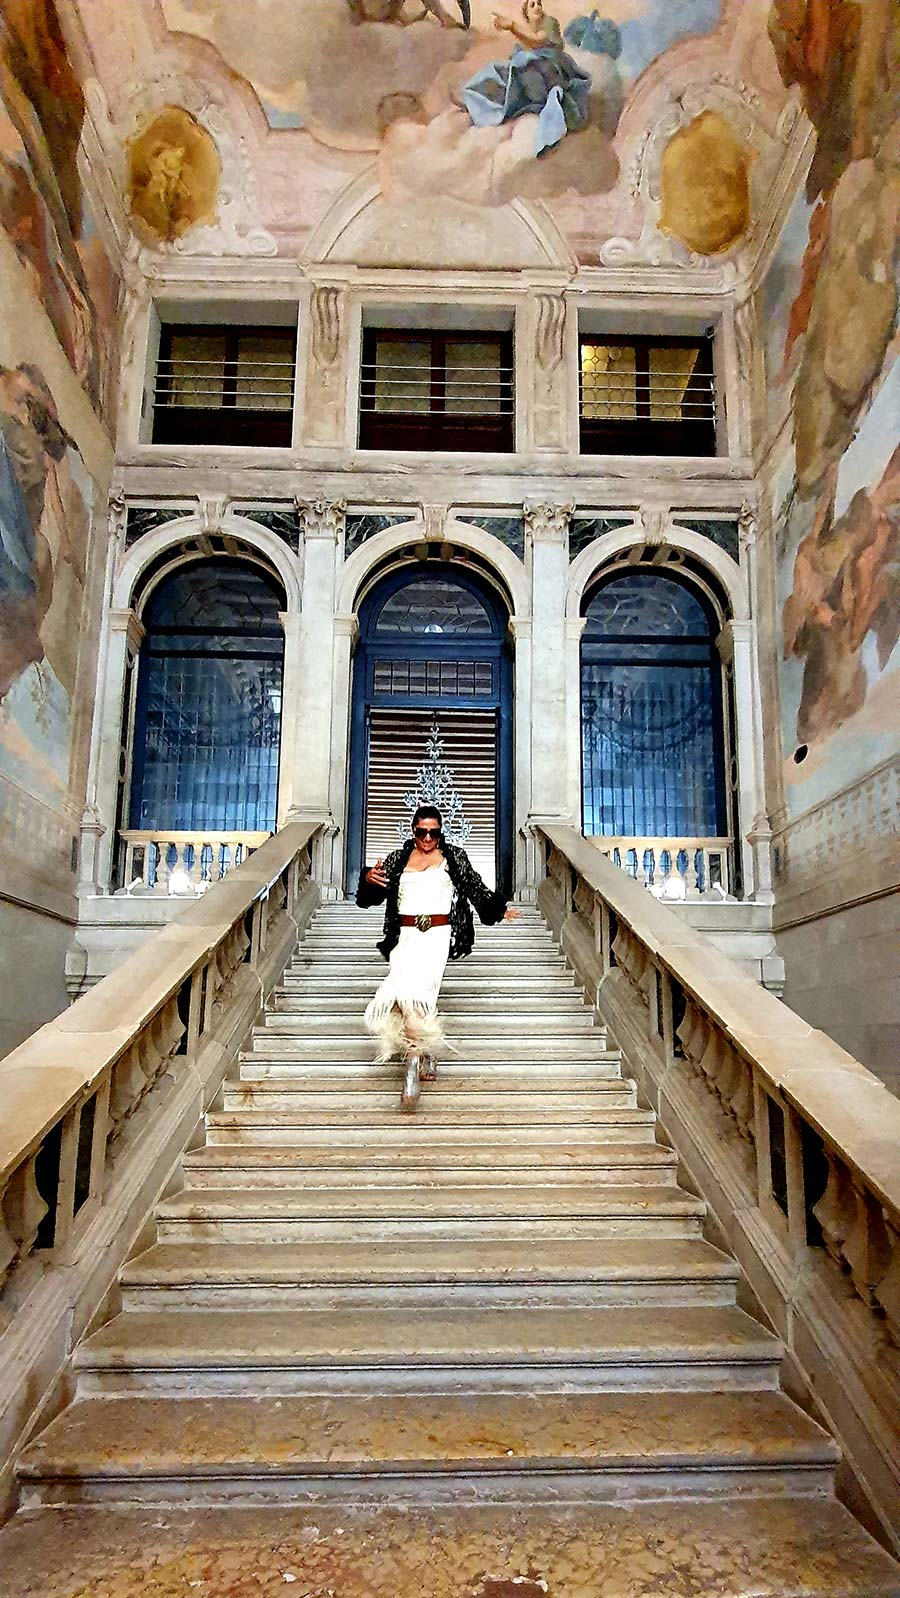 Ca' Sagredo Hotel Ventian palazzo italy ( stair case Gracie Opulanza